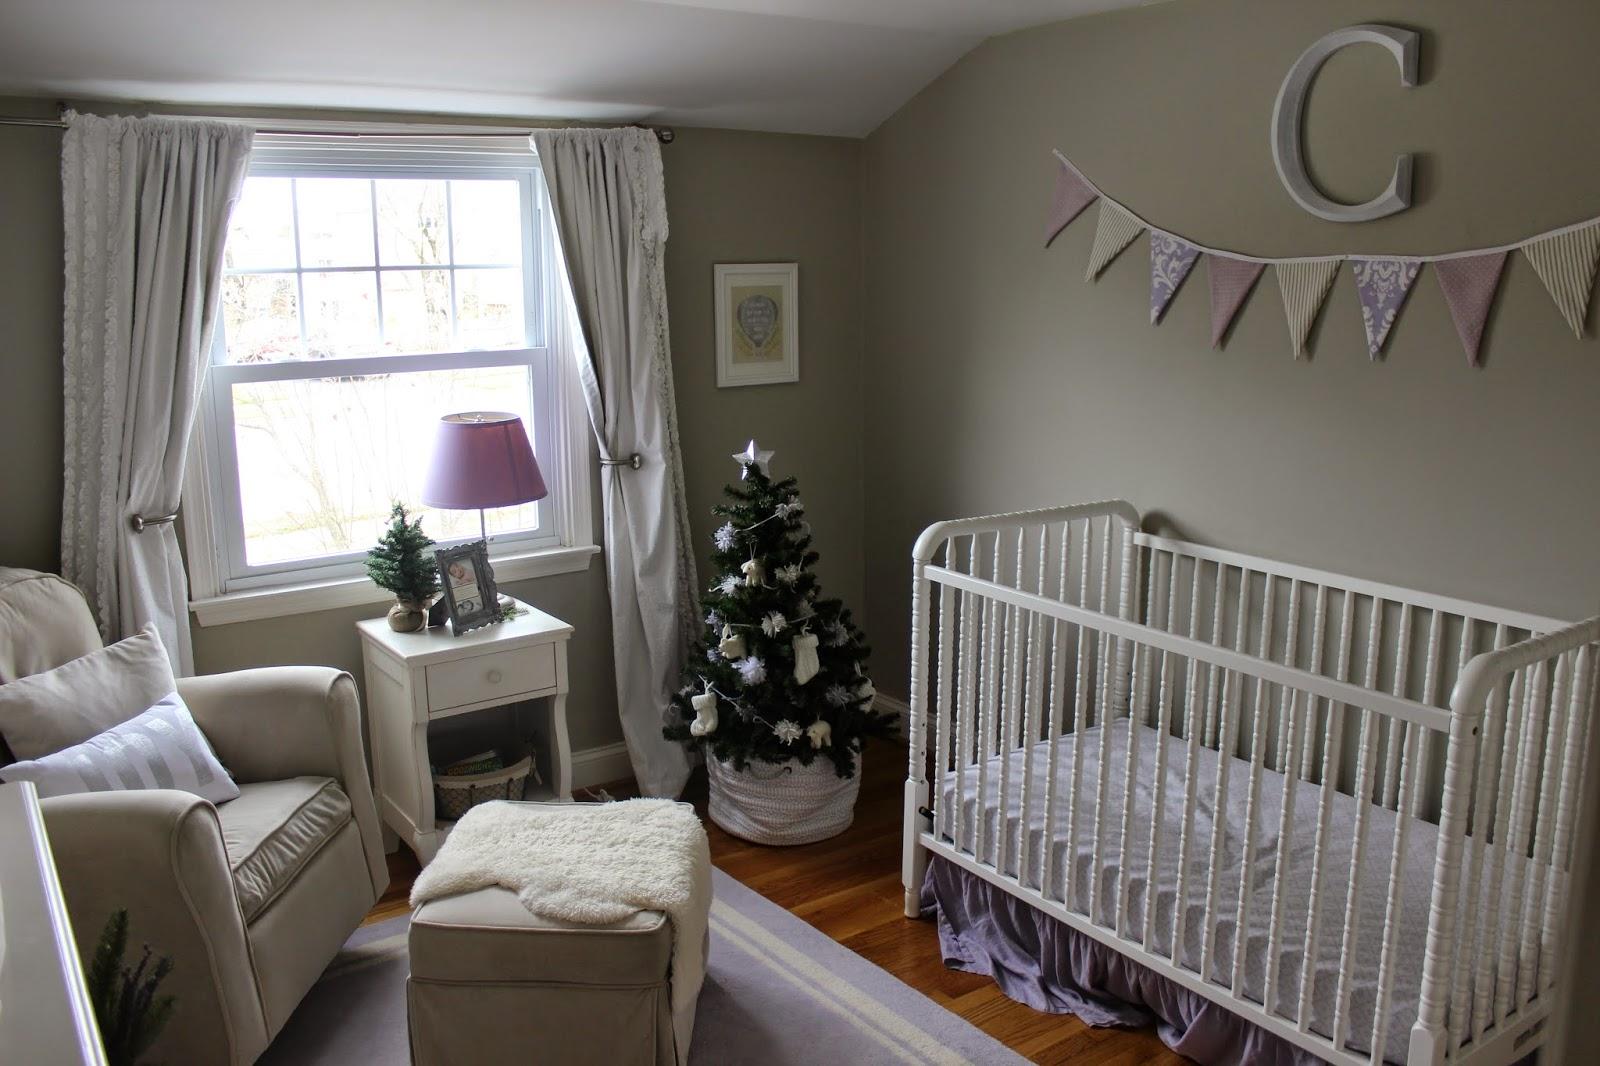 http://texasgirlinphilly.blogspot.com/2014/12/claires-christmas-nursery.html